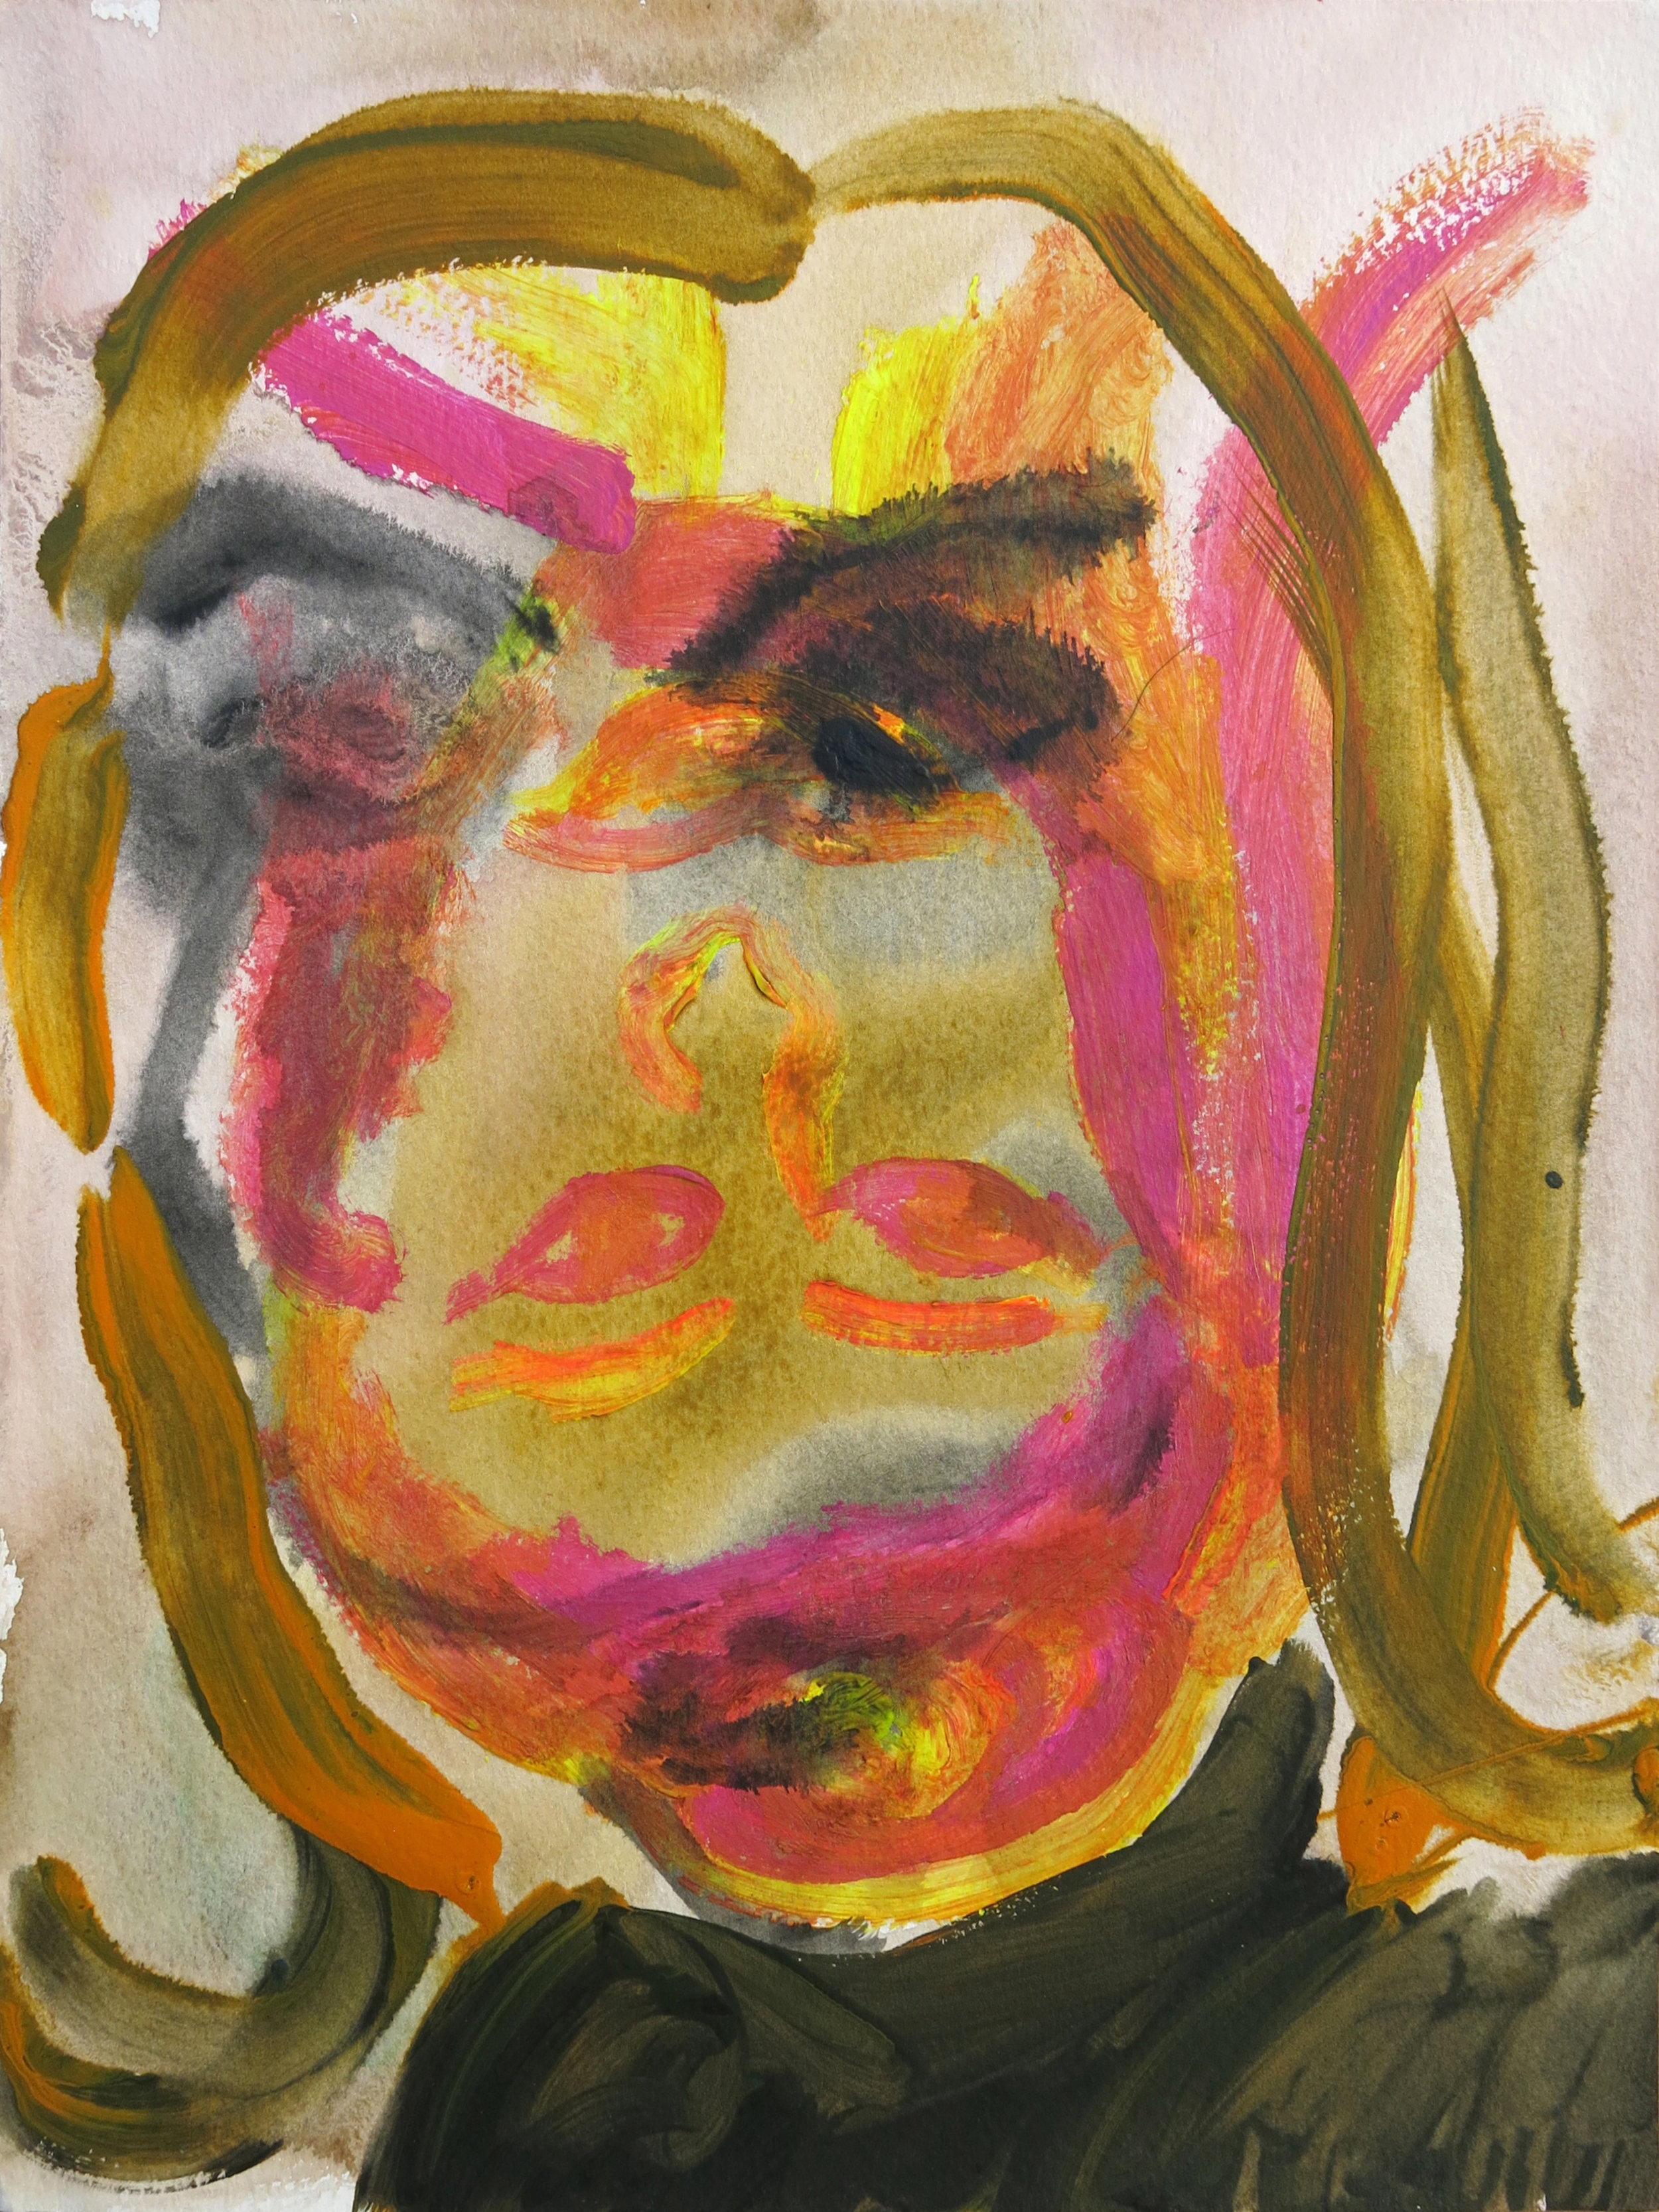 Barbra Streisand Portrait #45